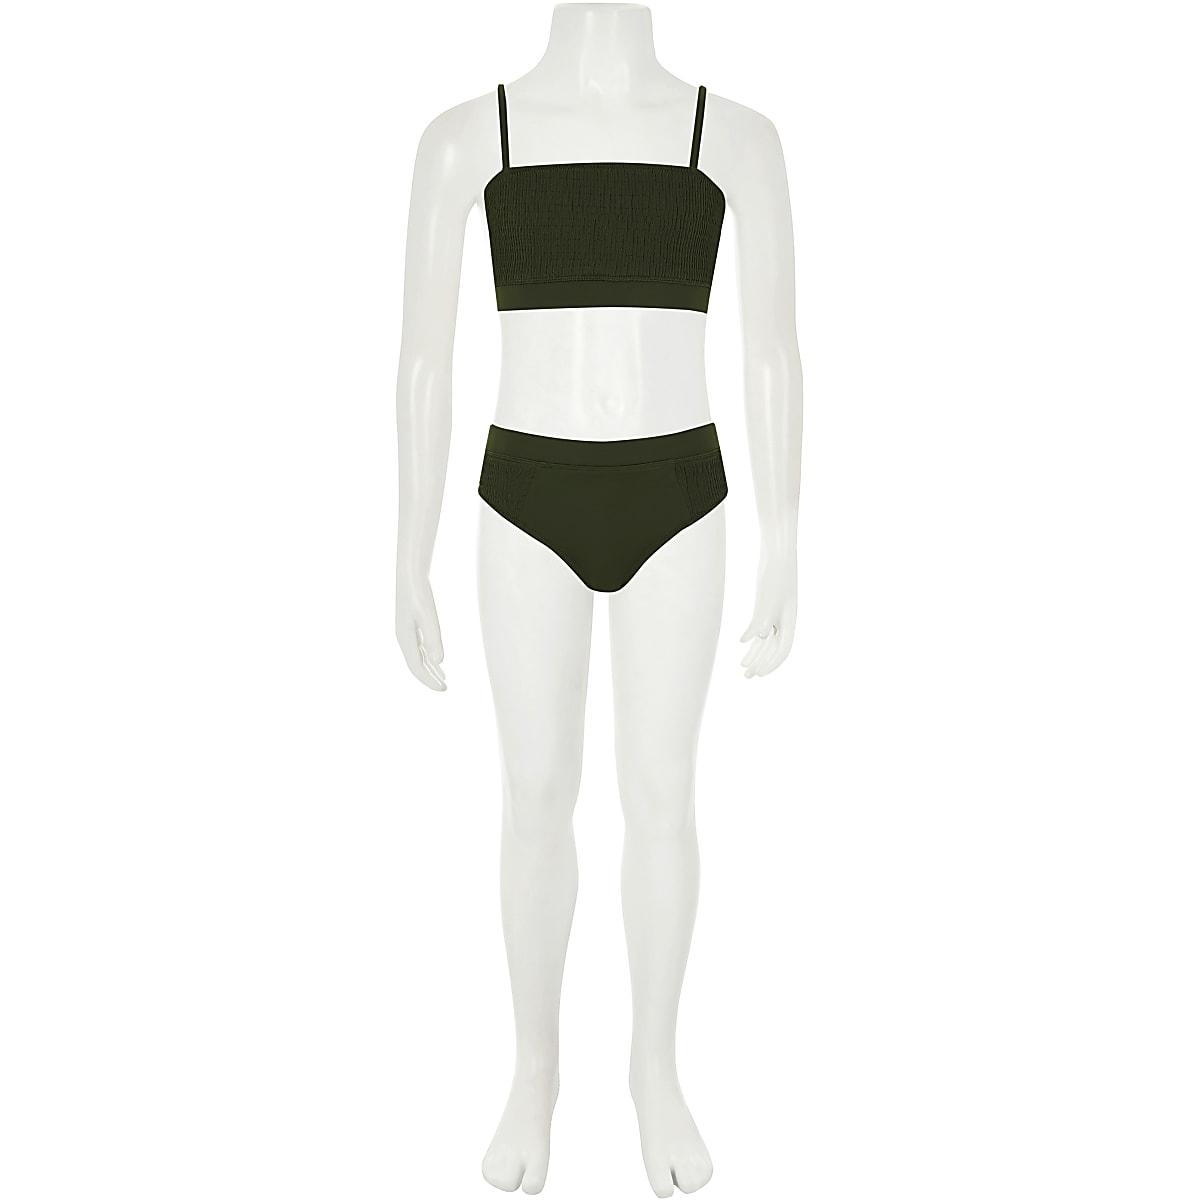 6fad91eff8eb3 Girls khaki green shirred bikini - Bikinis - Swimwear & Beachwear ...